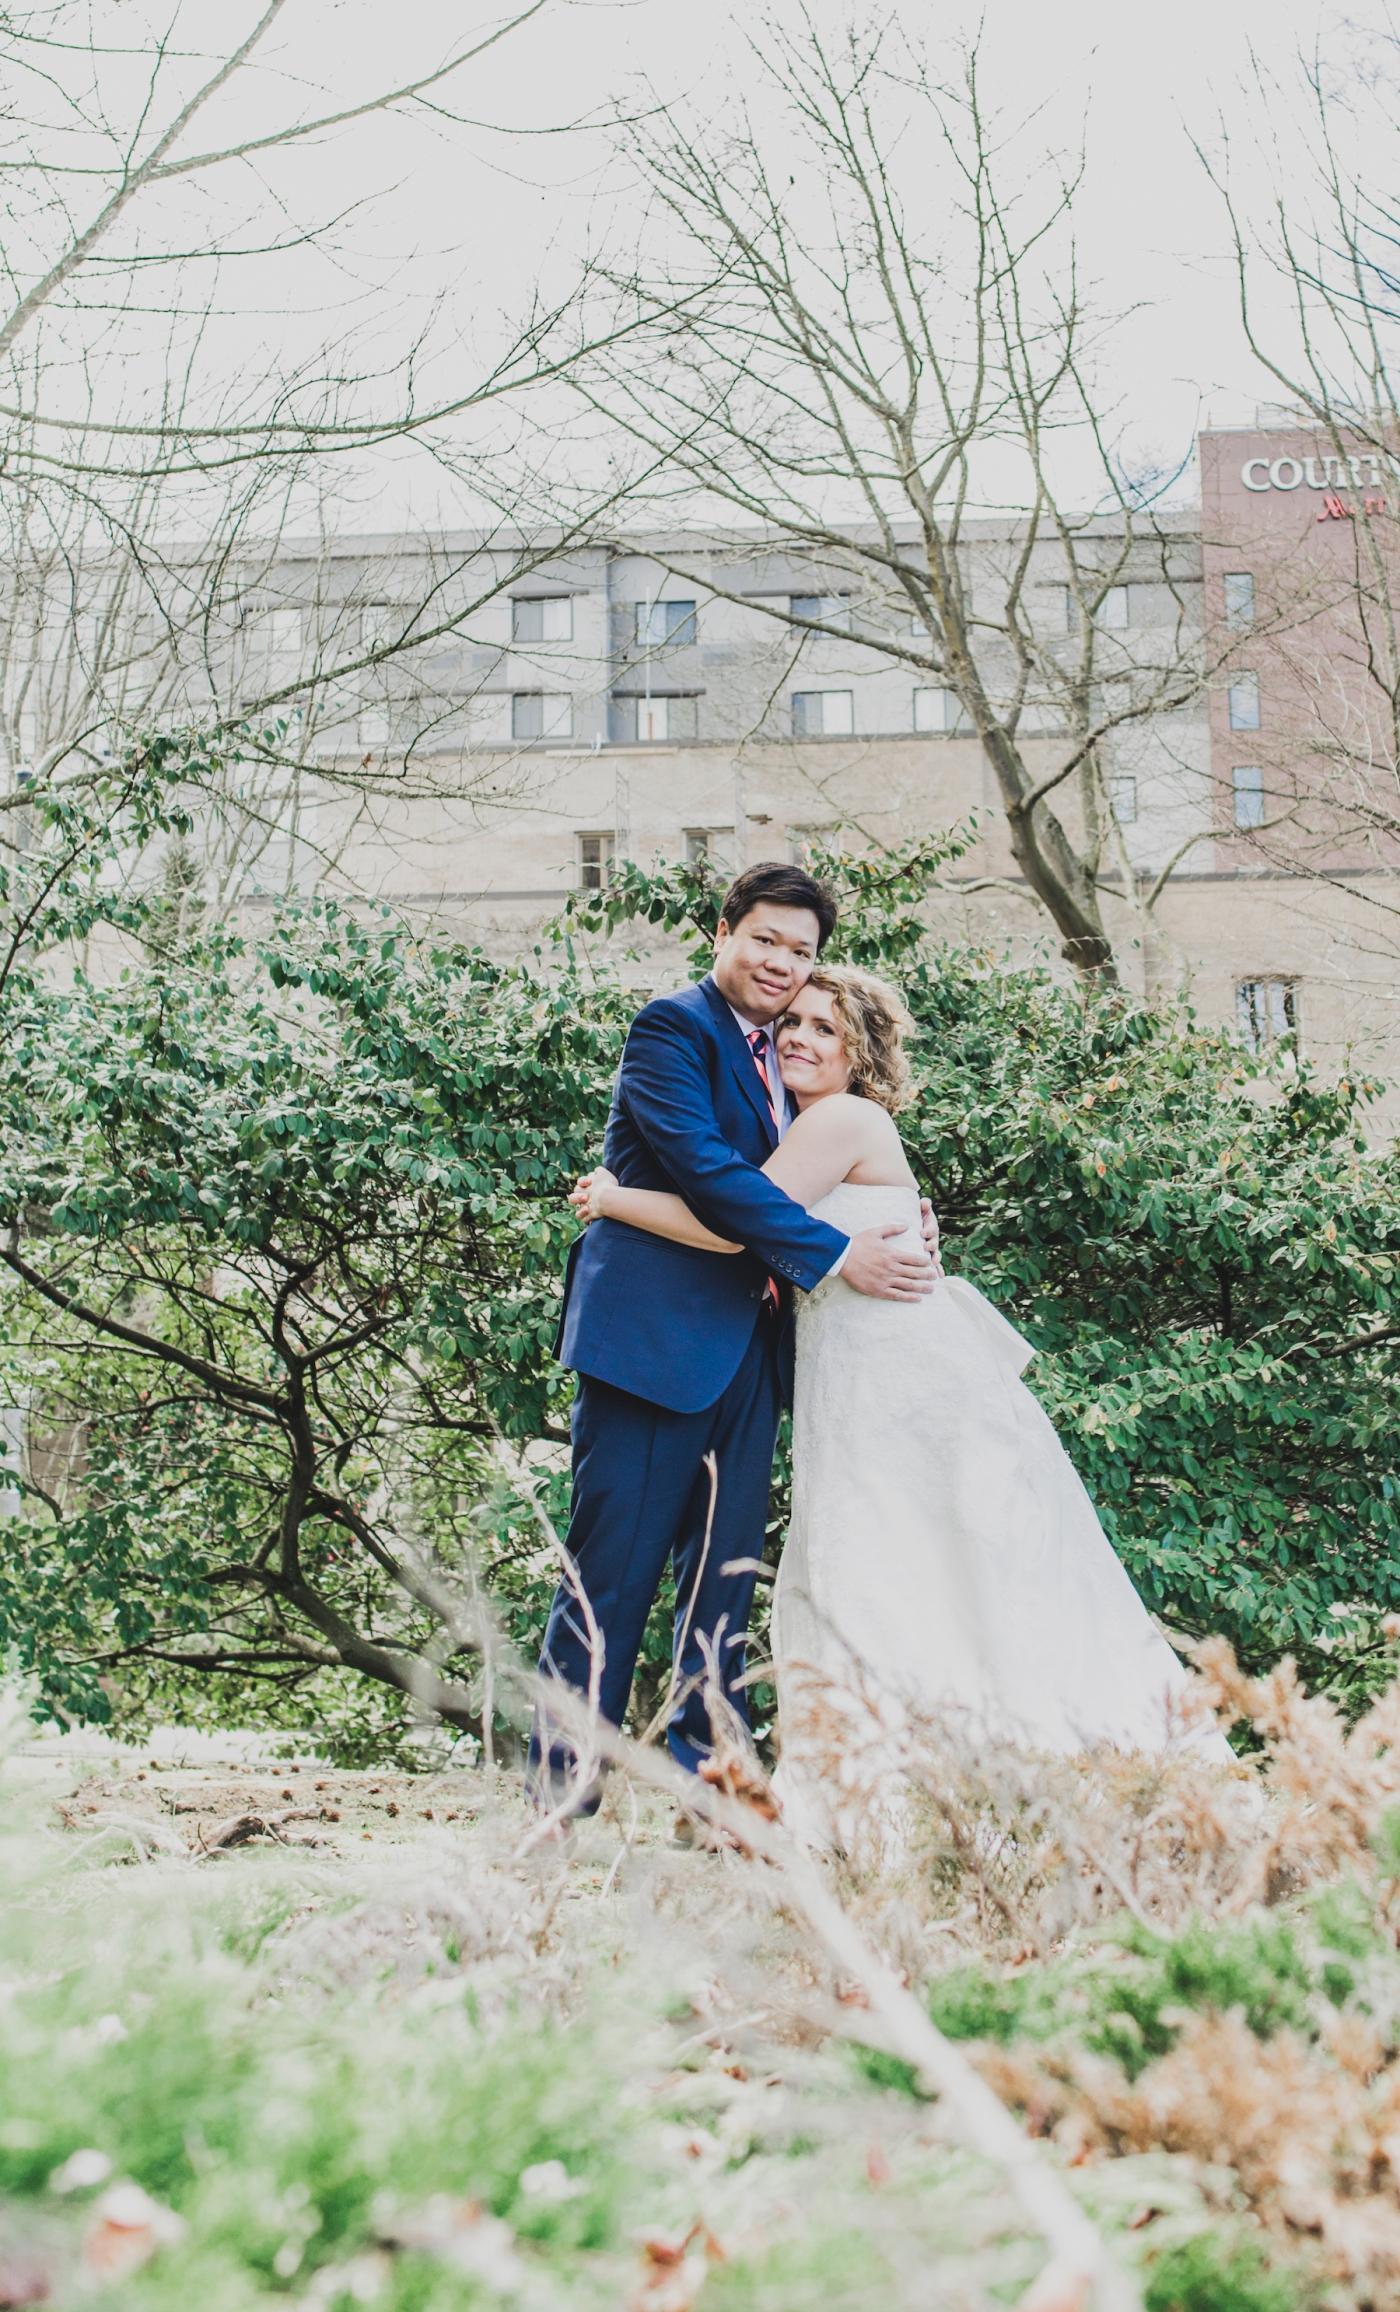 DSC_2319Everett_Wedding_Ballroom_Jane_Speleers_photography_Rachel_and_Edmund_Bridesmaids_peach_dresses_groomsmen_2017